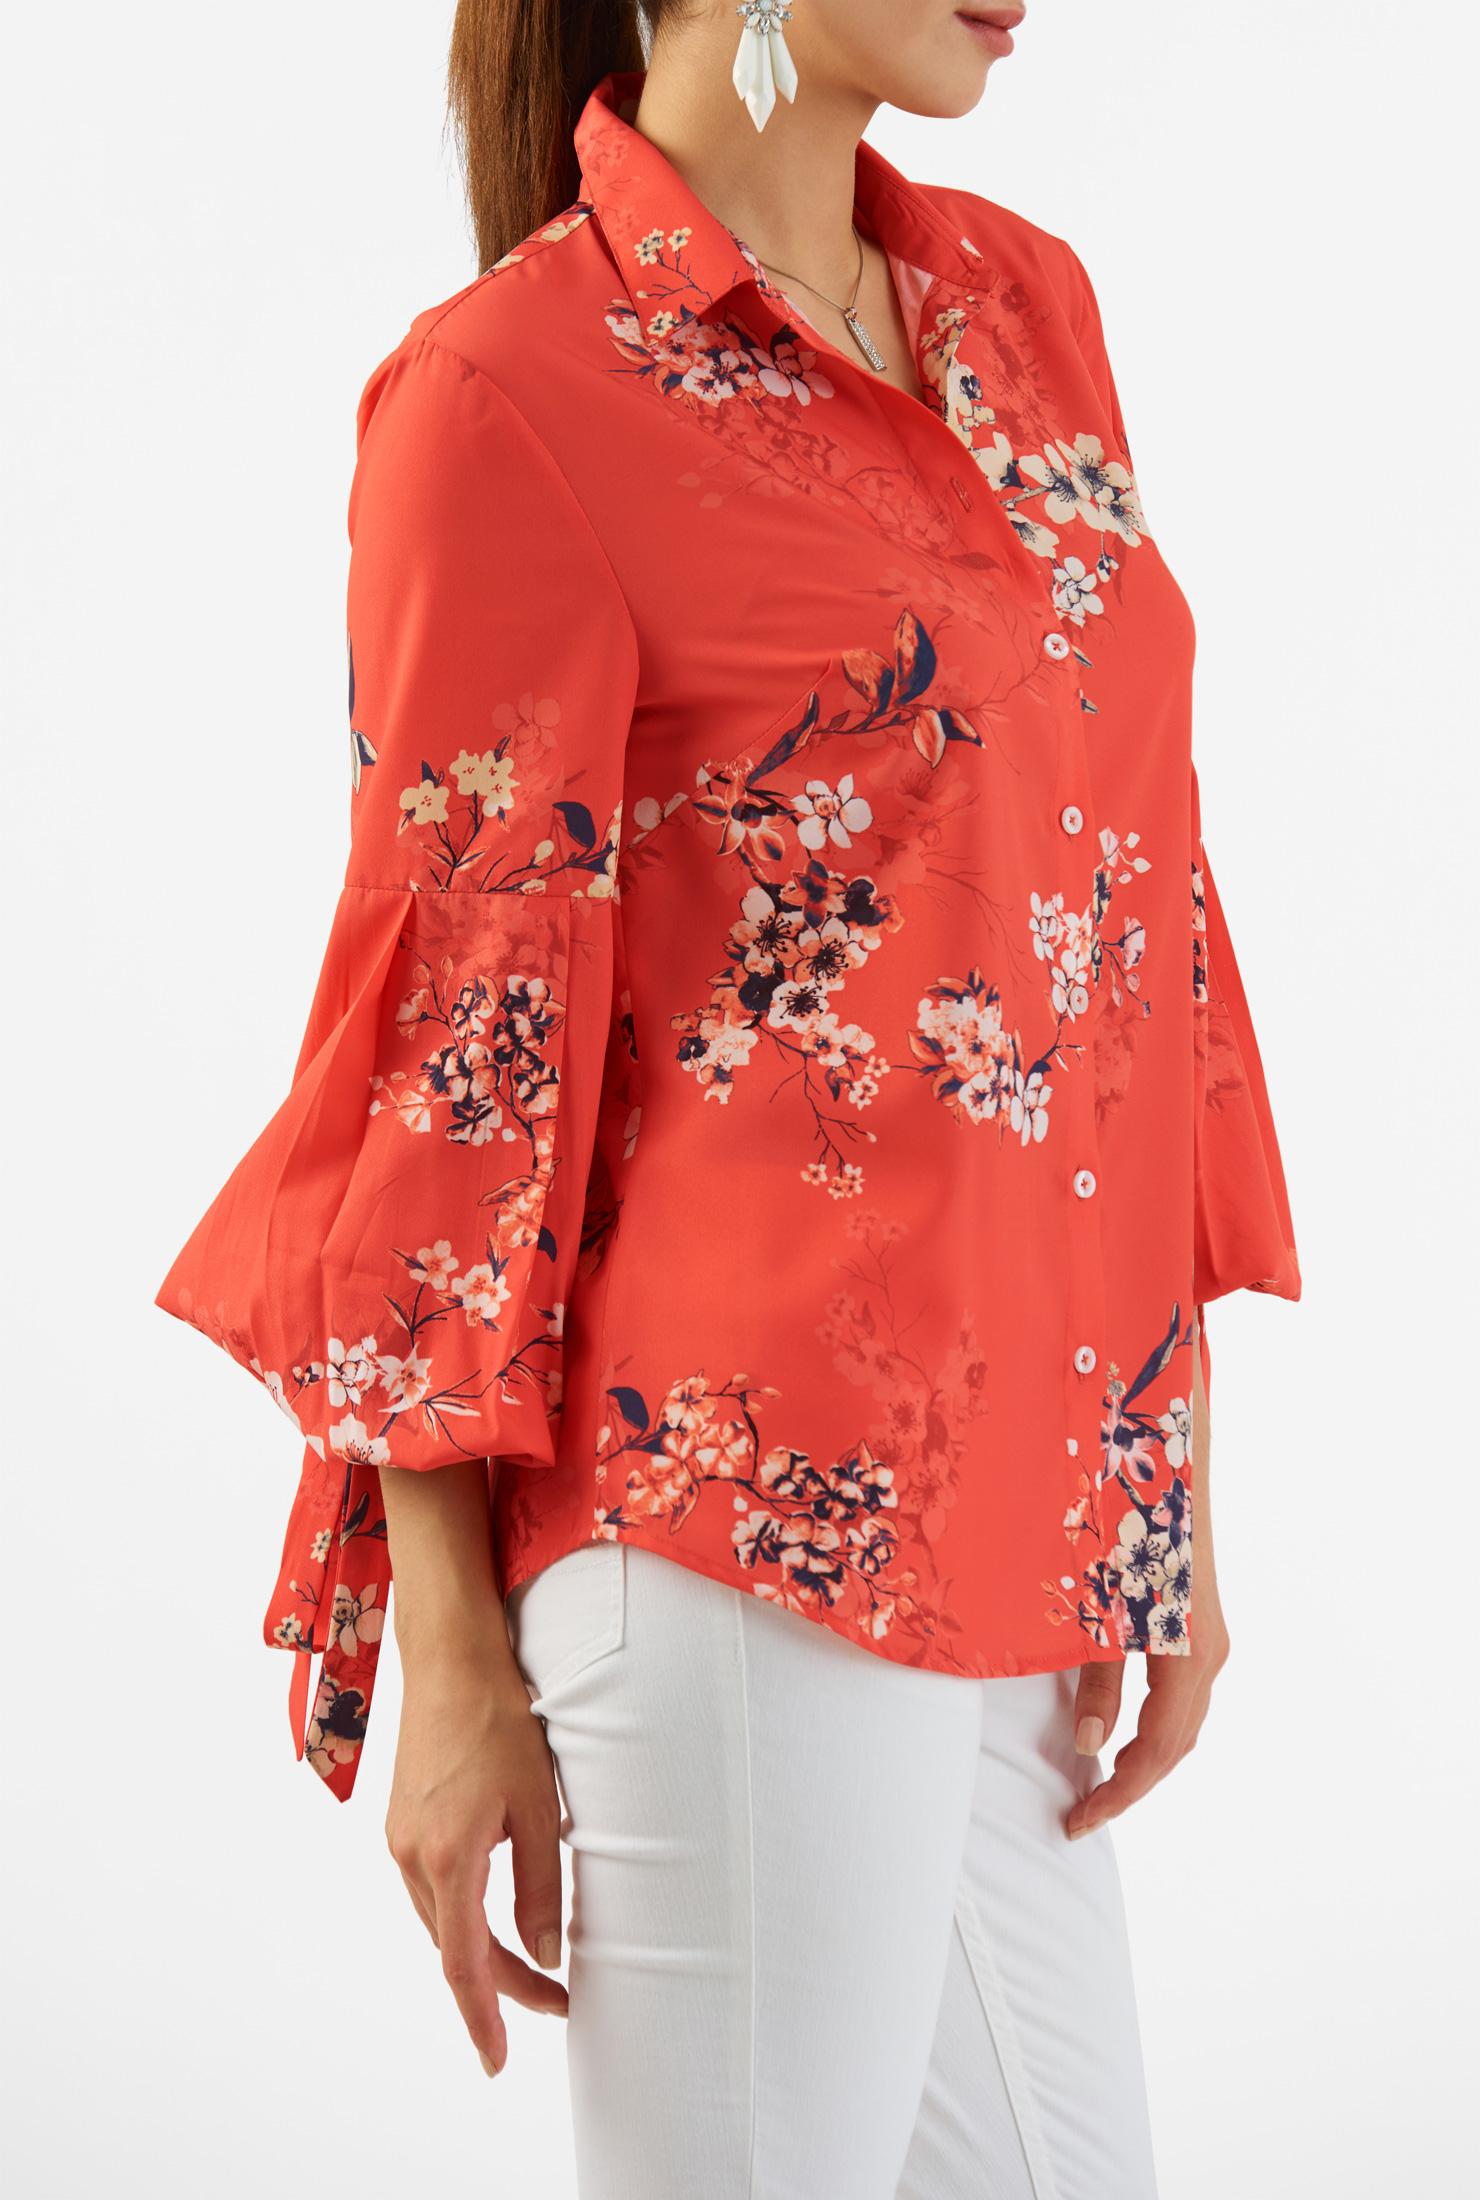 eShakti Women's Floral print crepe statement sleeve shirt CL0049789